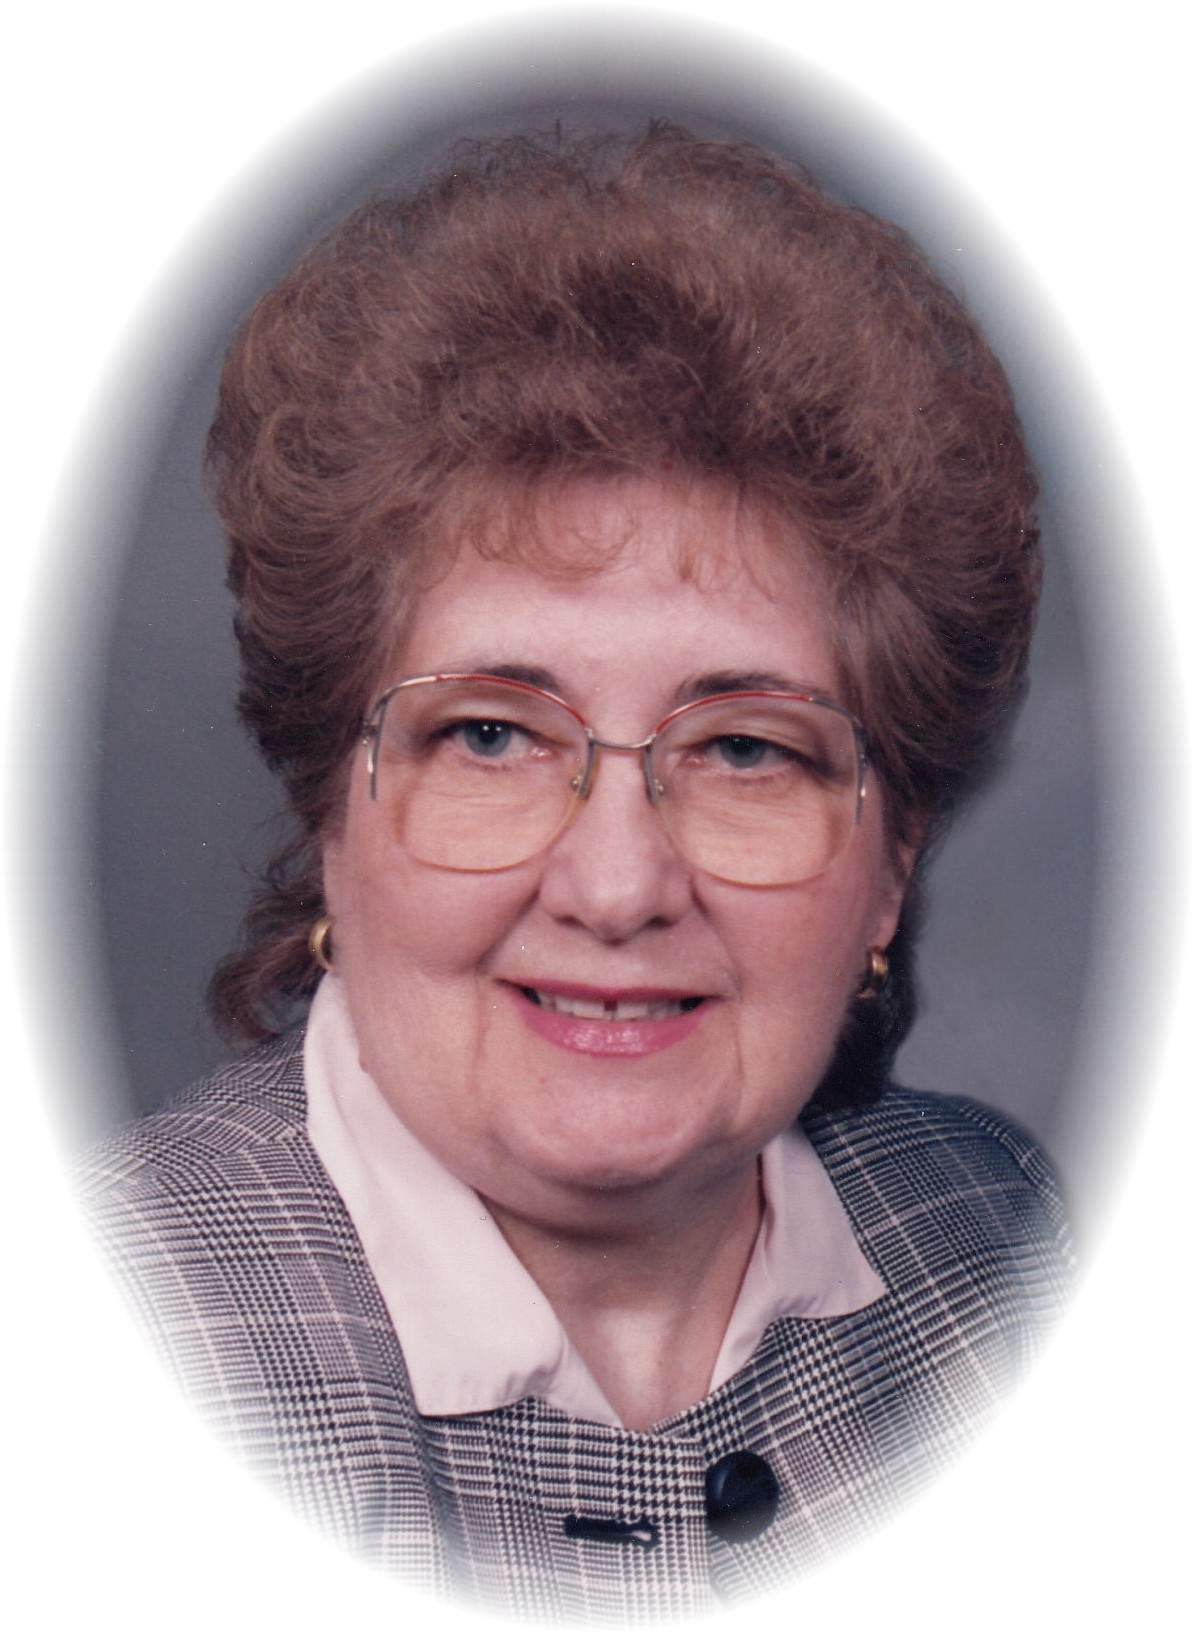 Norma Jean McCurdy, of Pinckneyville